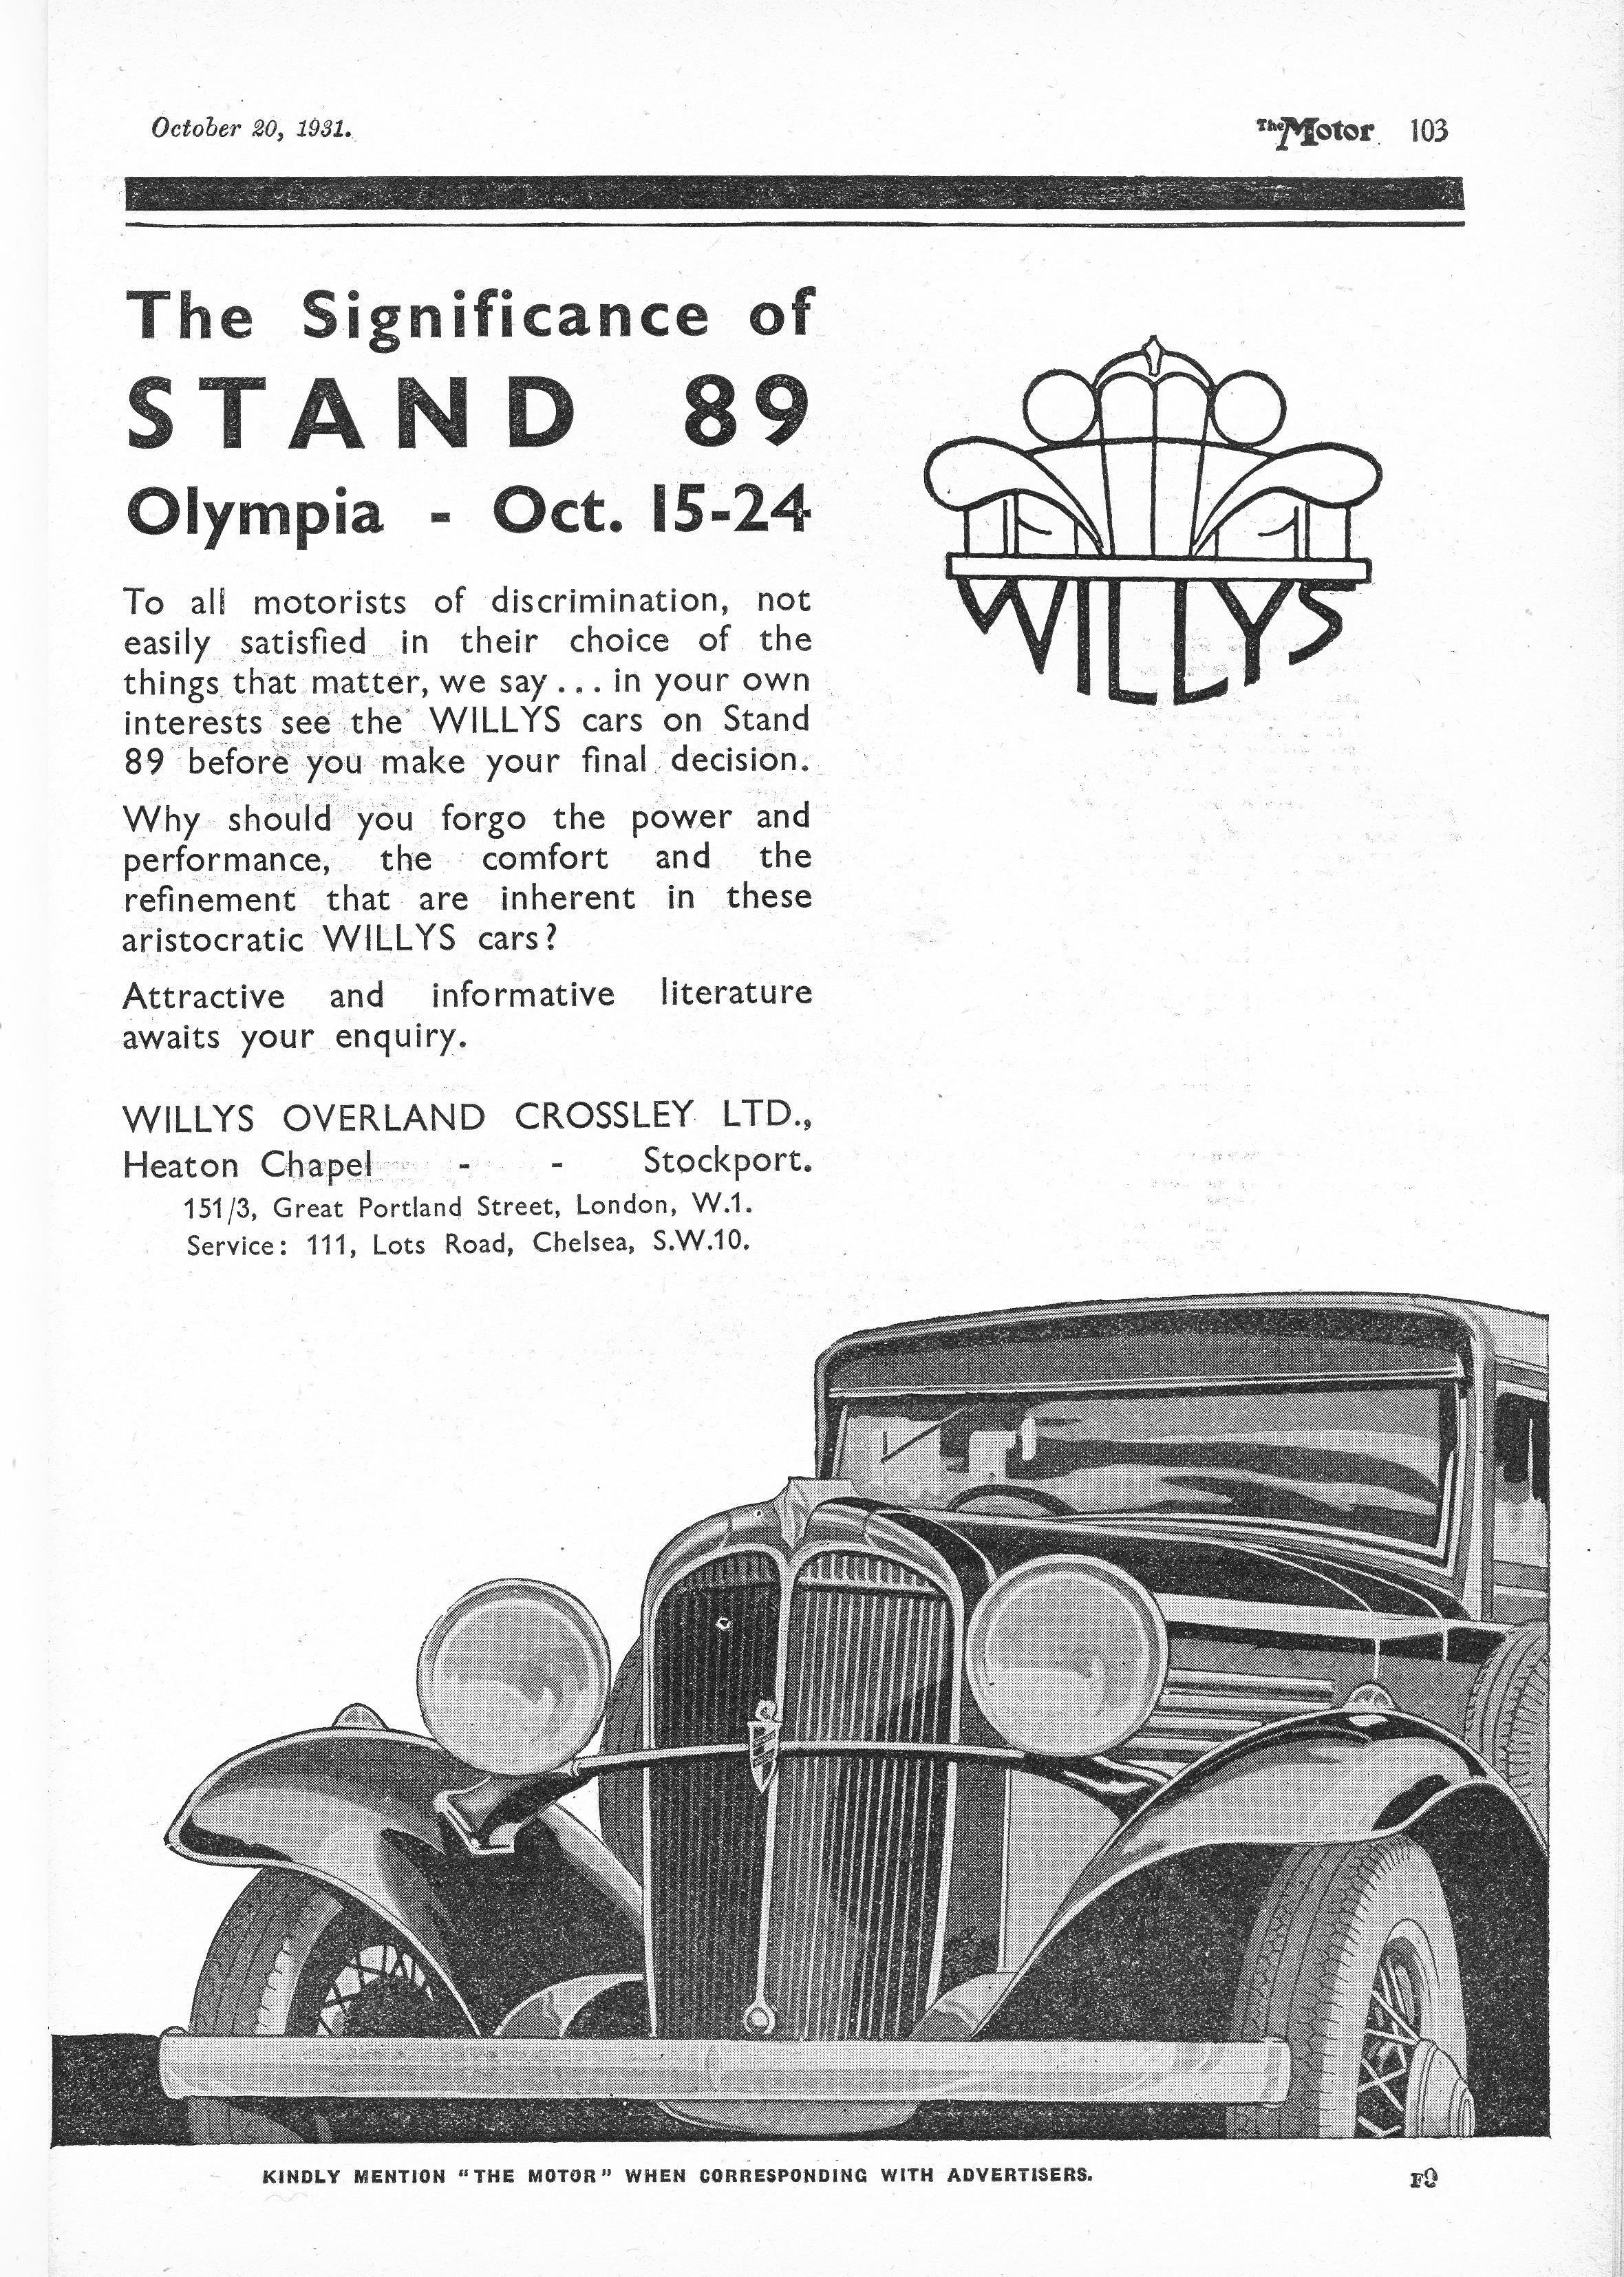 Willys Saloon Motor Car Autocar Advert 1931 Starye Plakaty Plakat